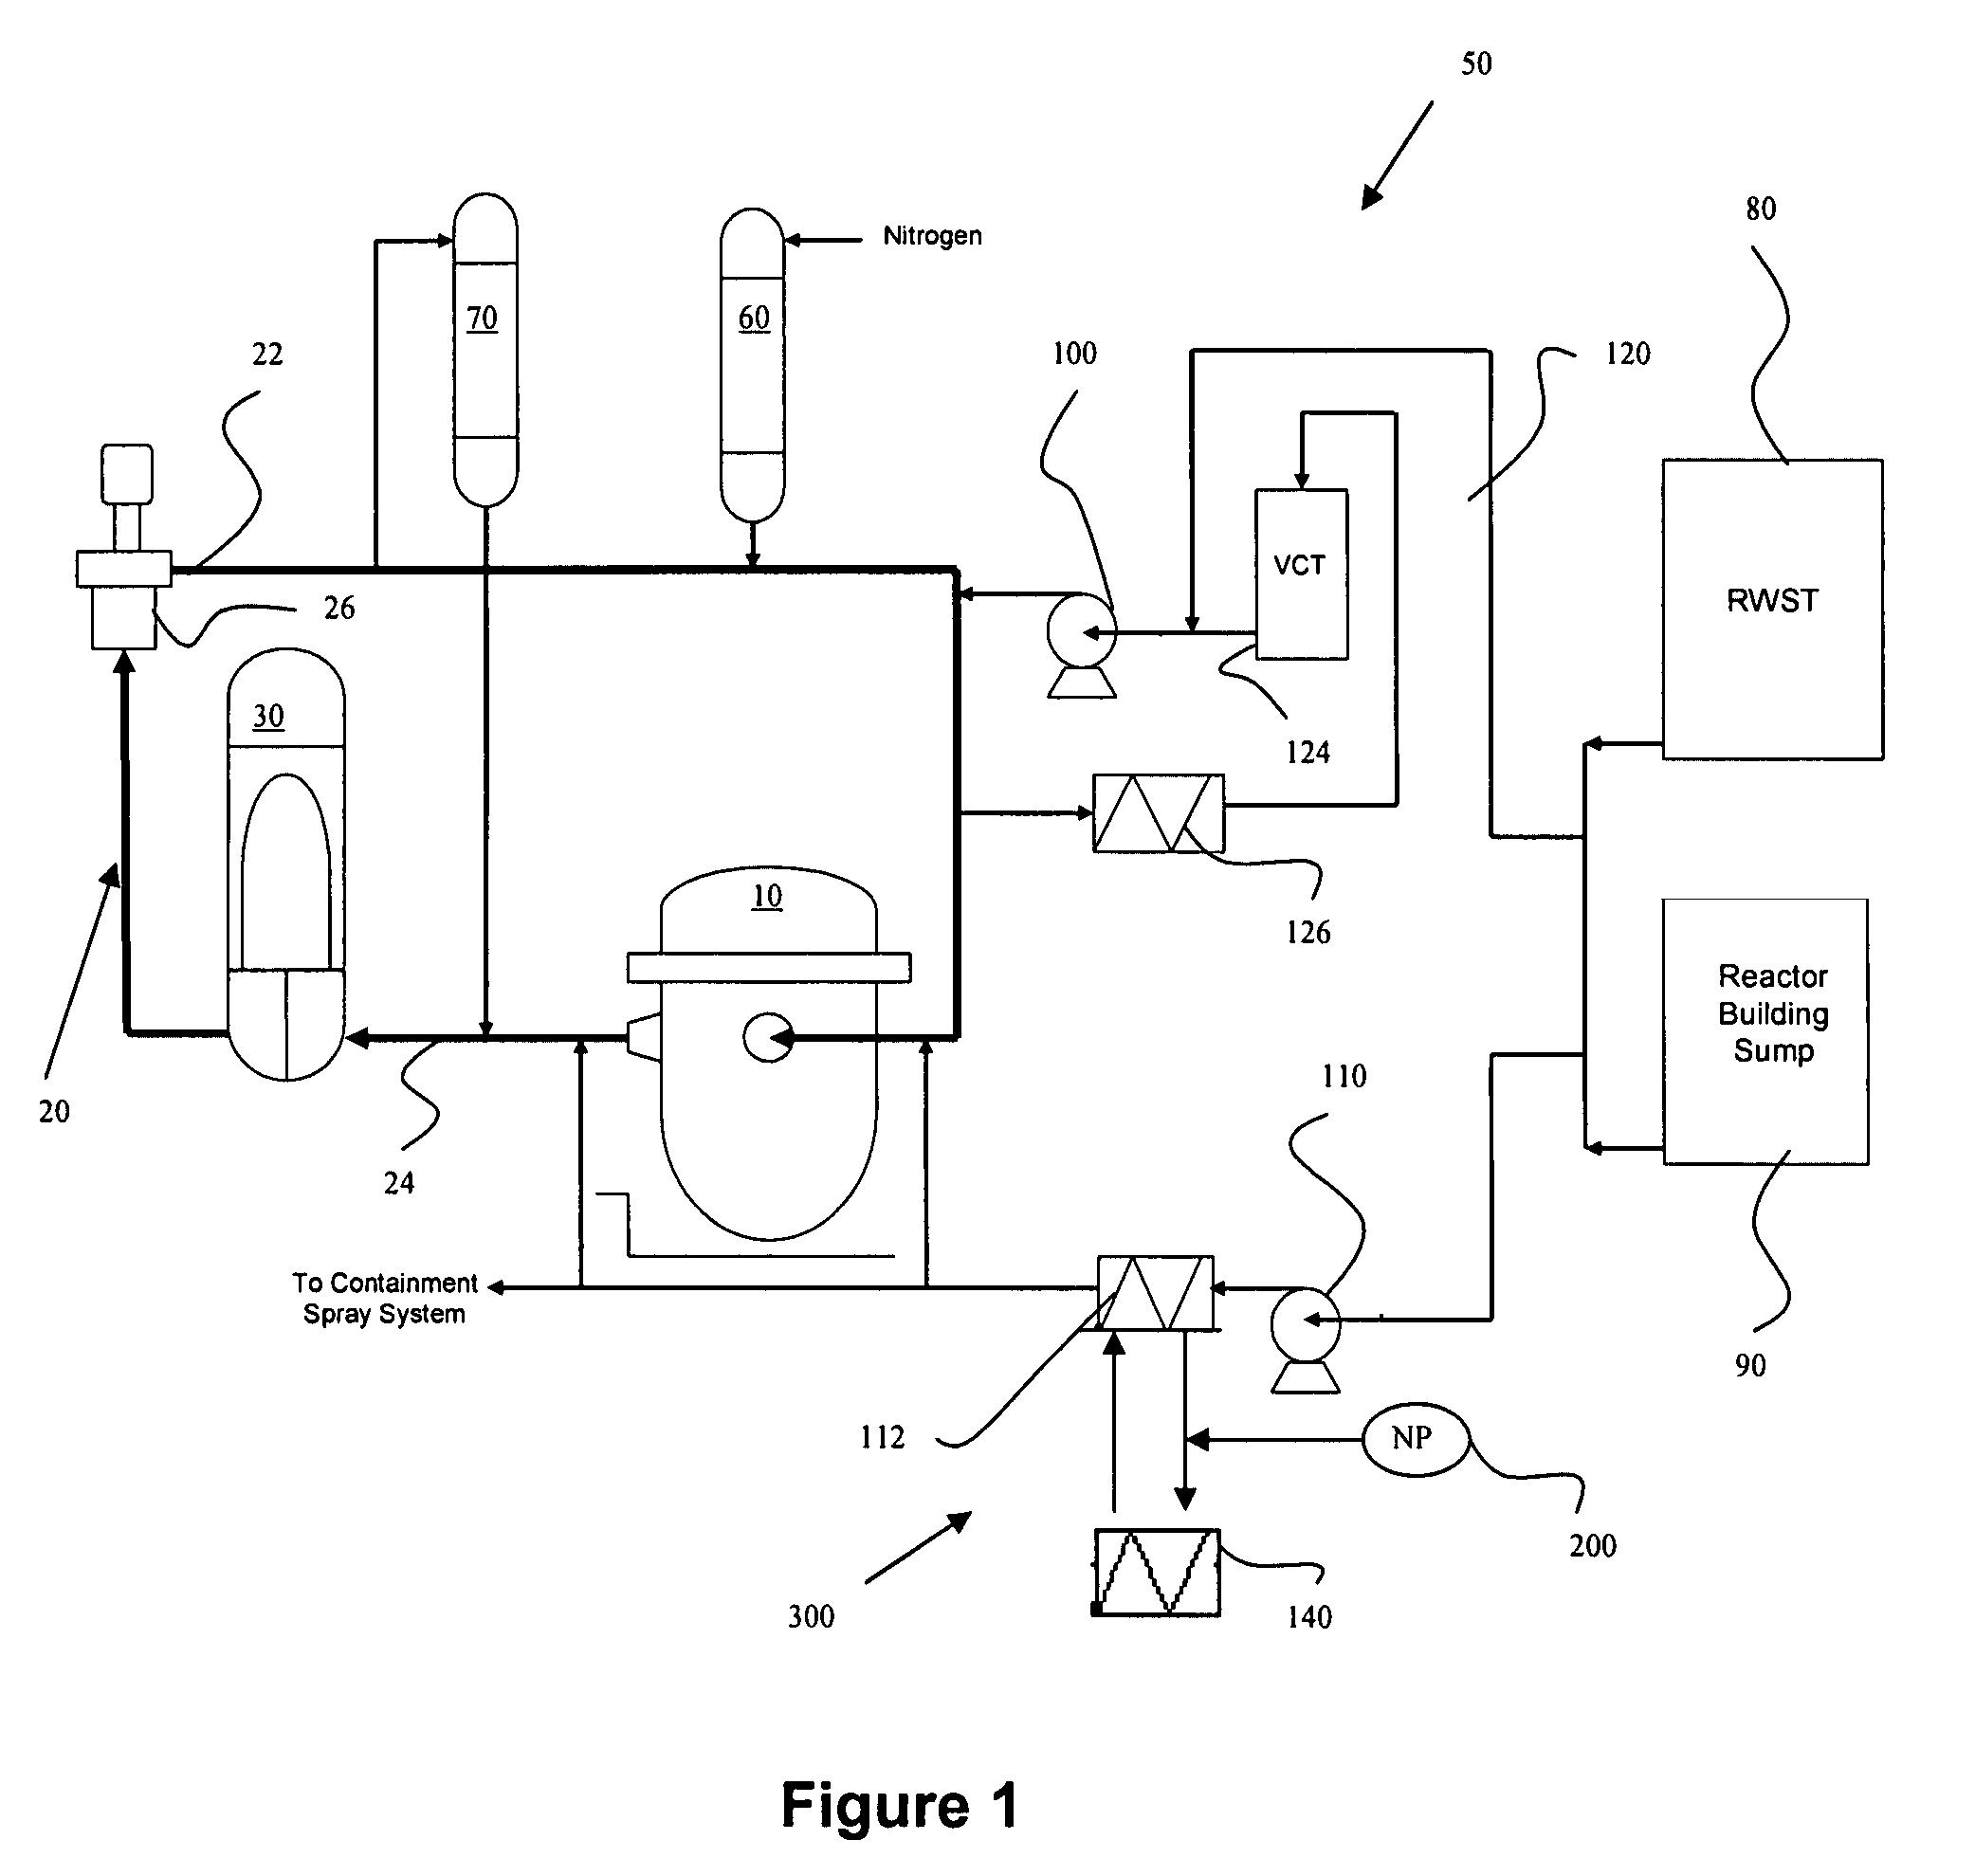 Nuclear Power Plant Circuit Diagram